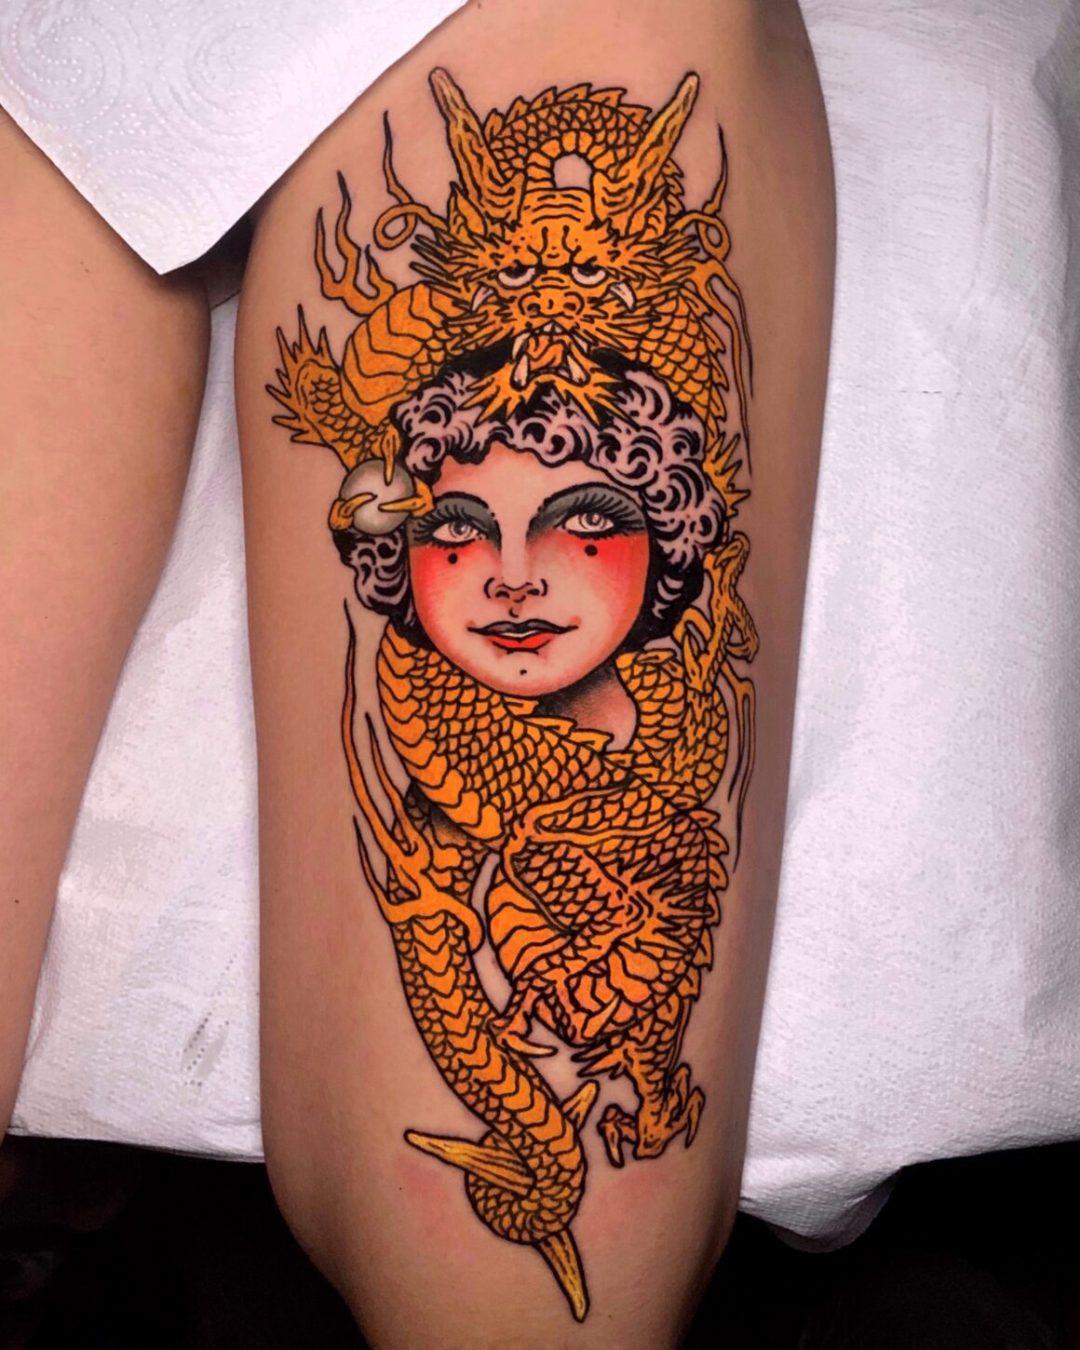 Tattoo by Pablo Lillo, @pablolillotattoo